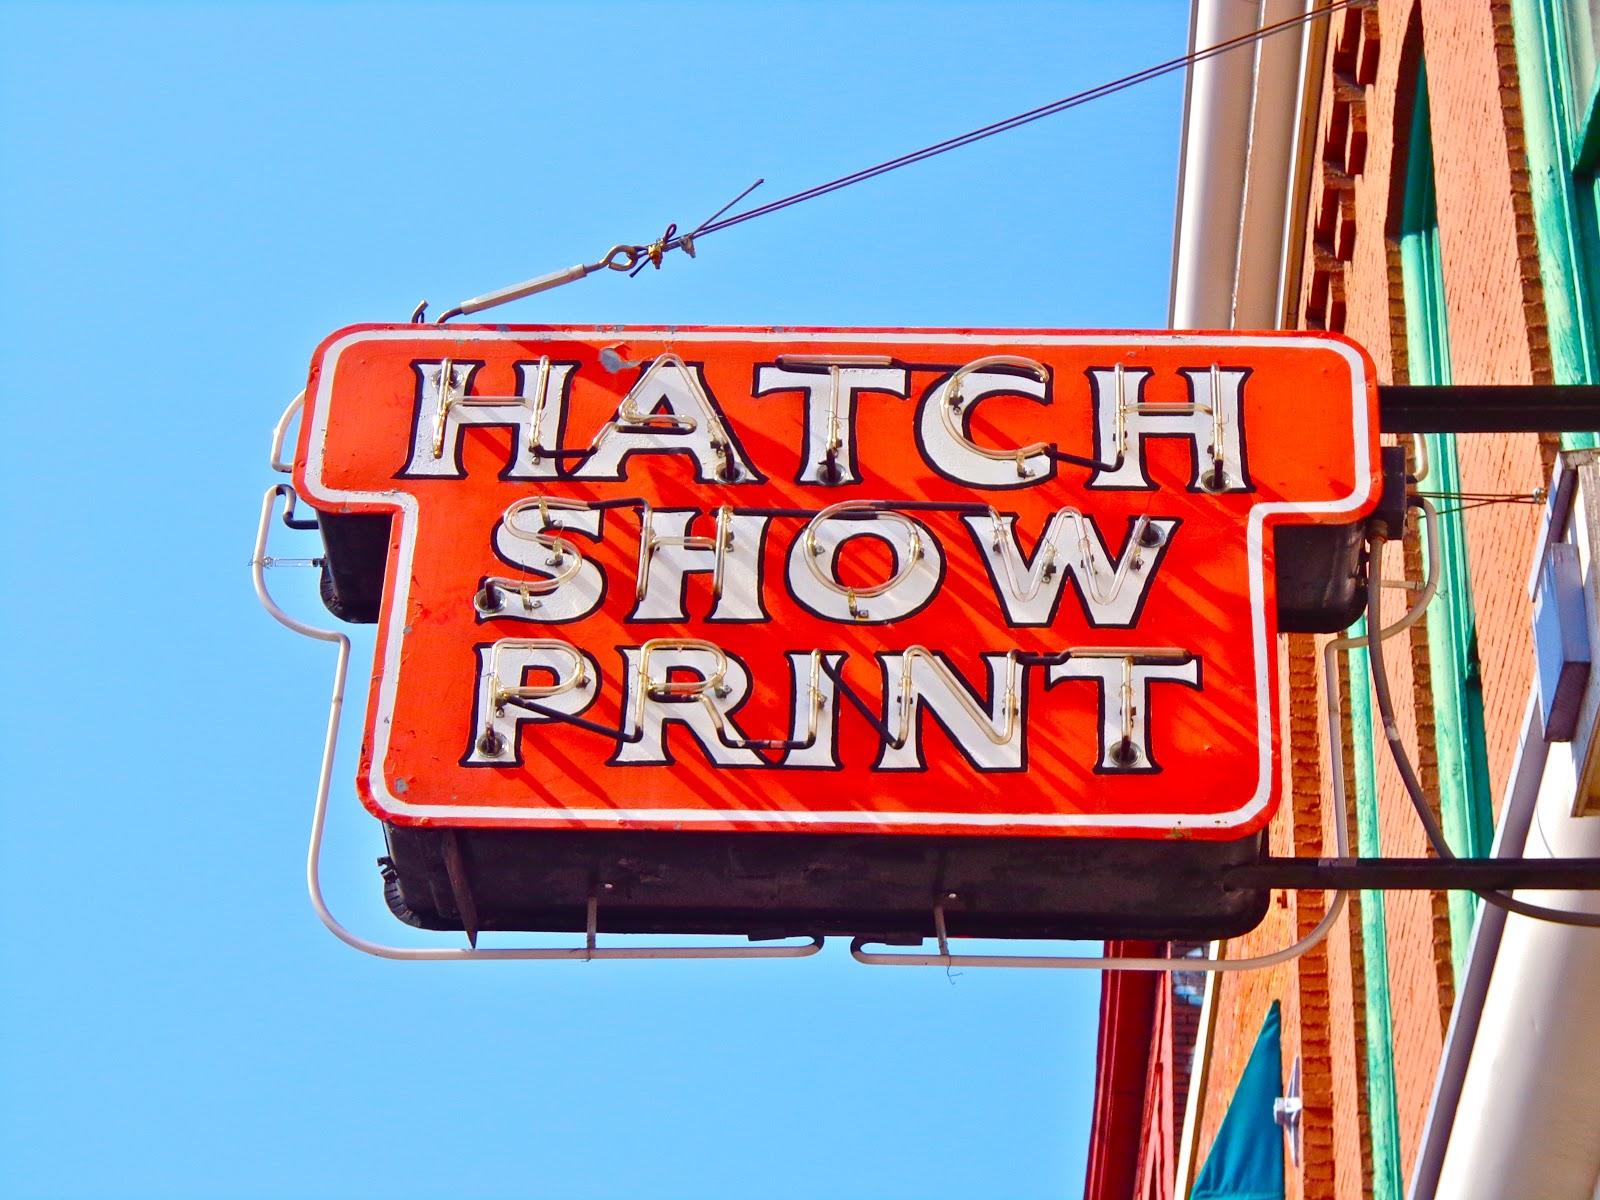 Pocketful of Ginch: Hatch Show Print in Nashville